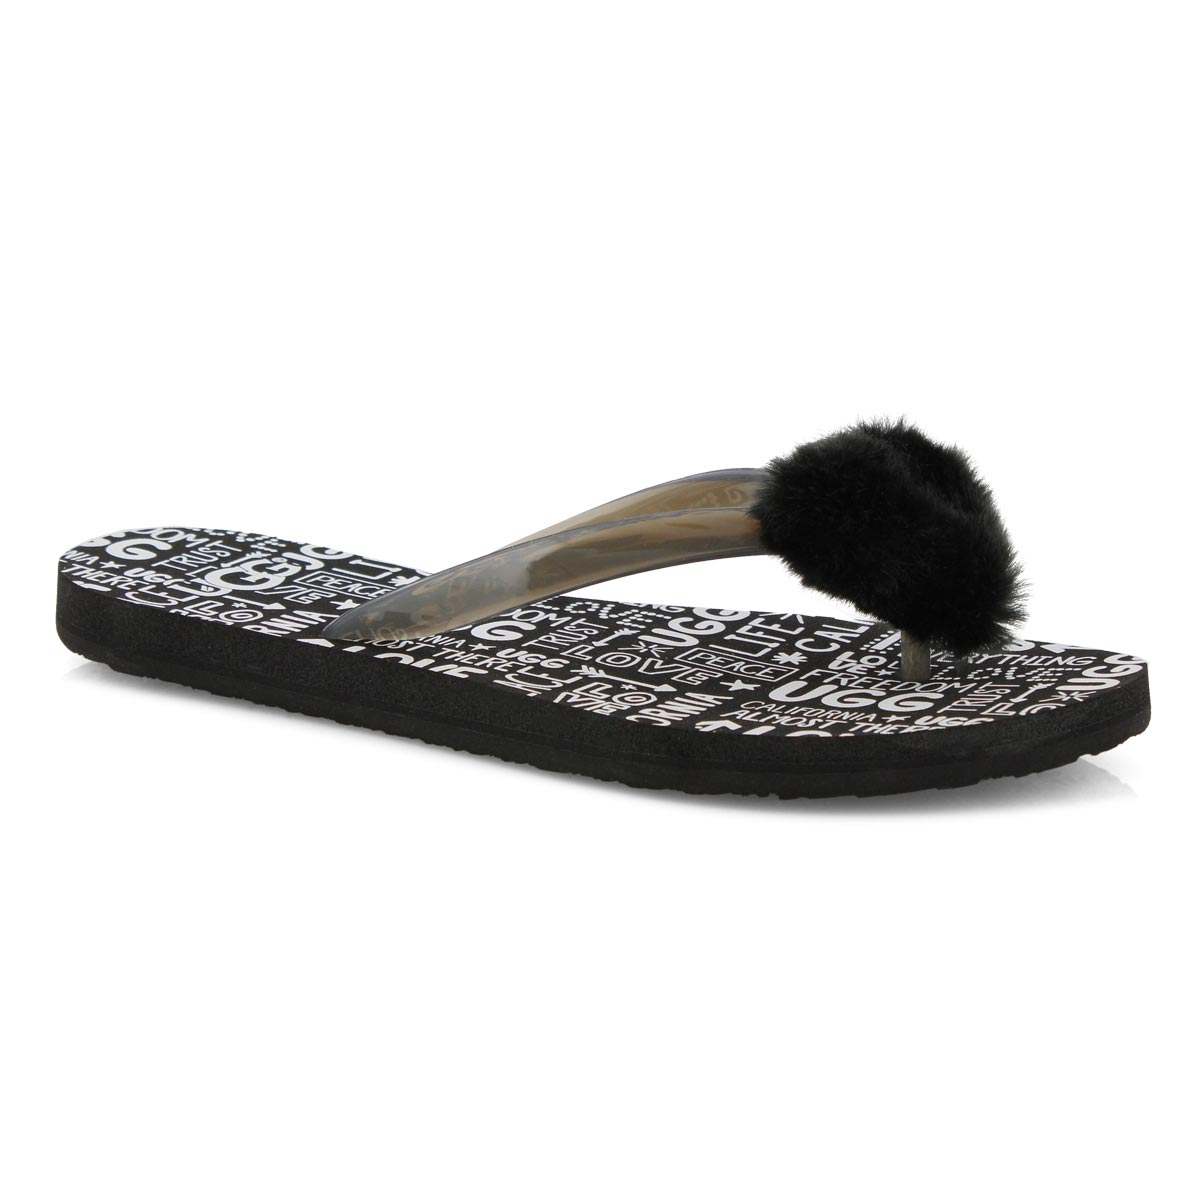 Women's SIMI FLUFF MANIFESTO thong sandals